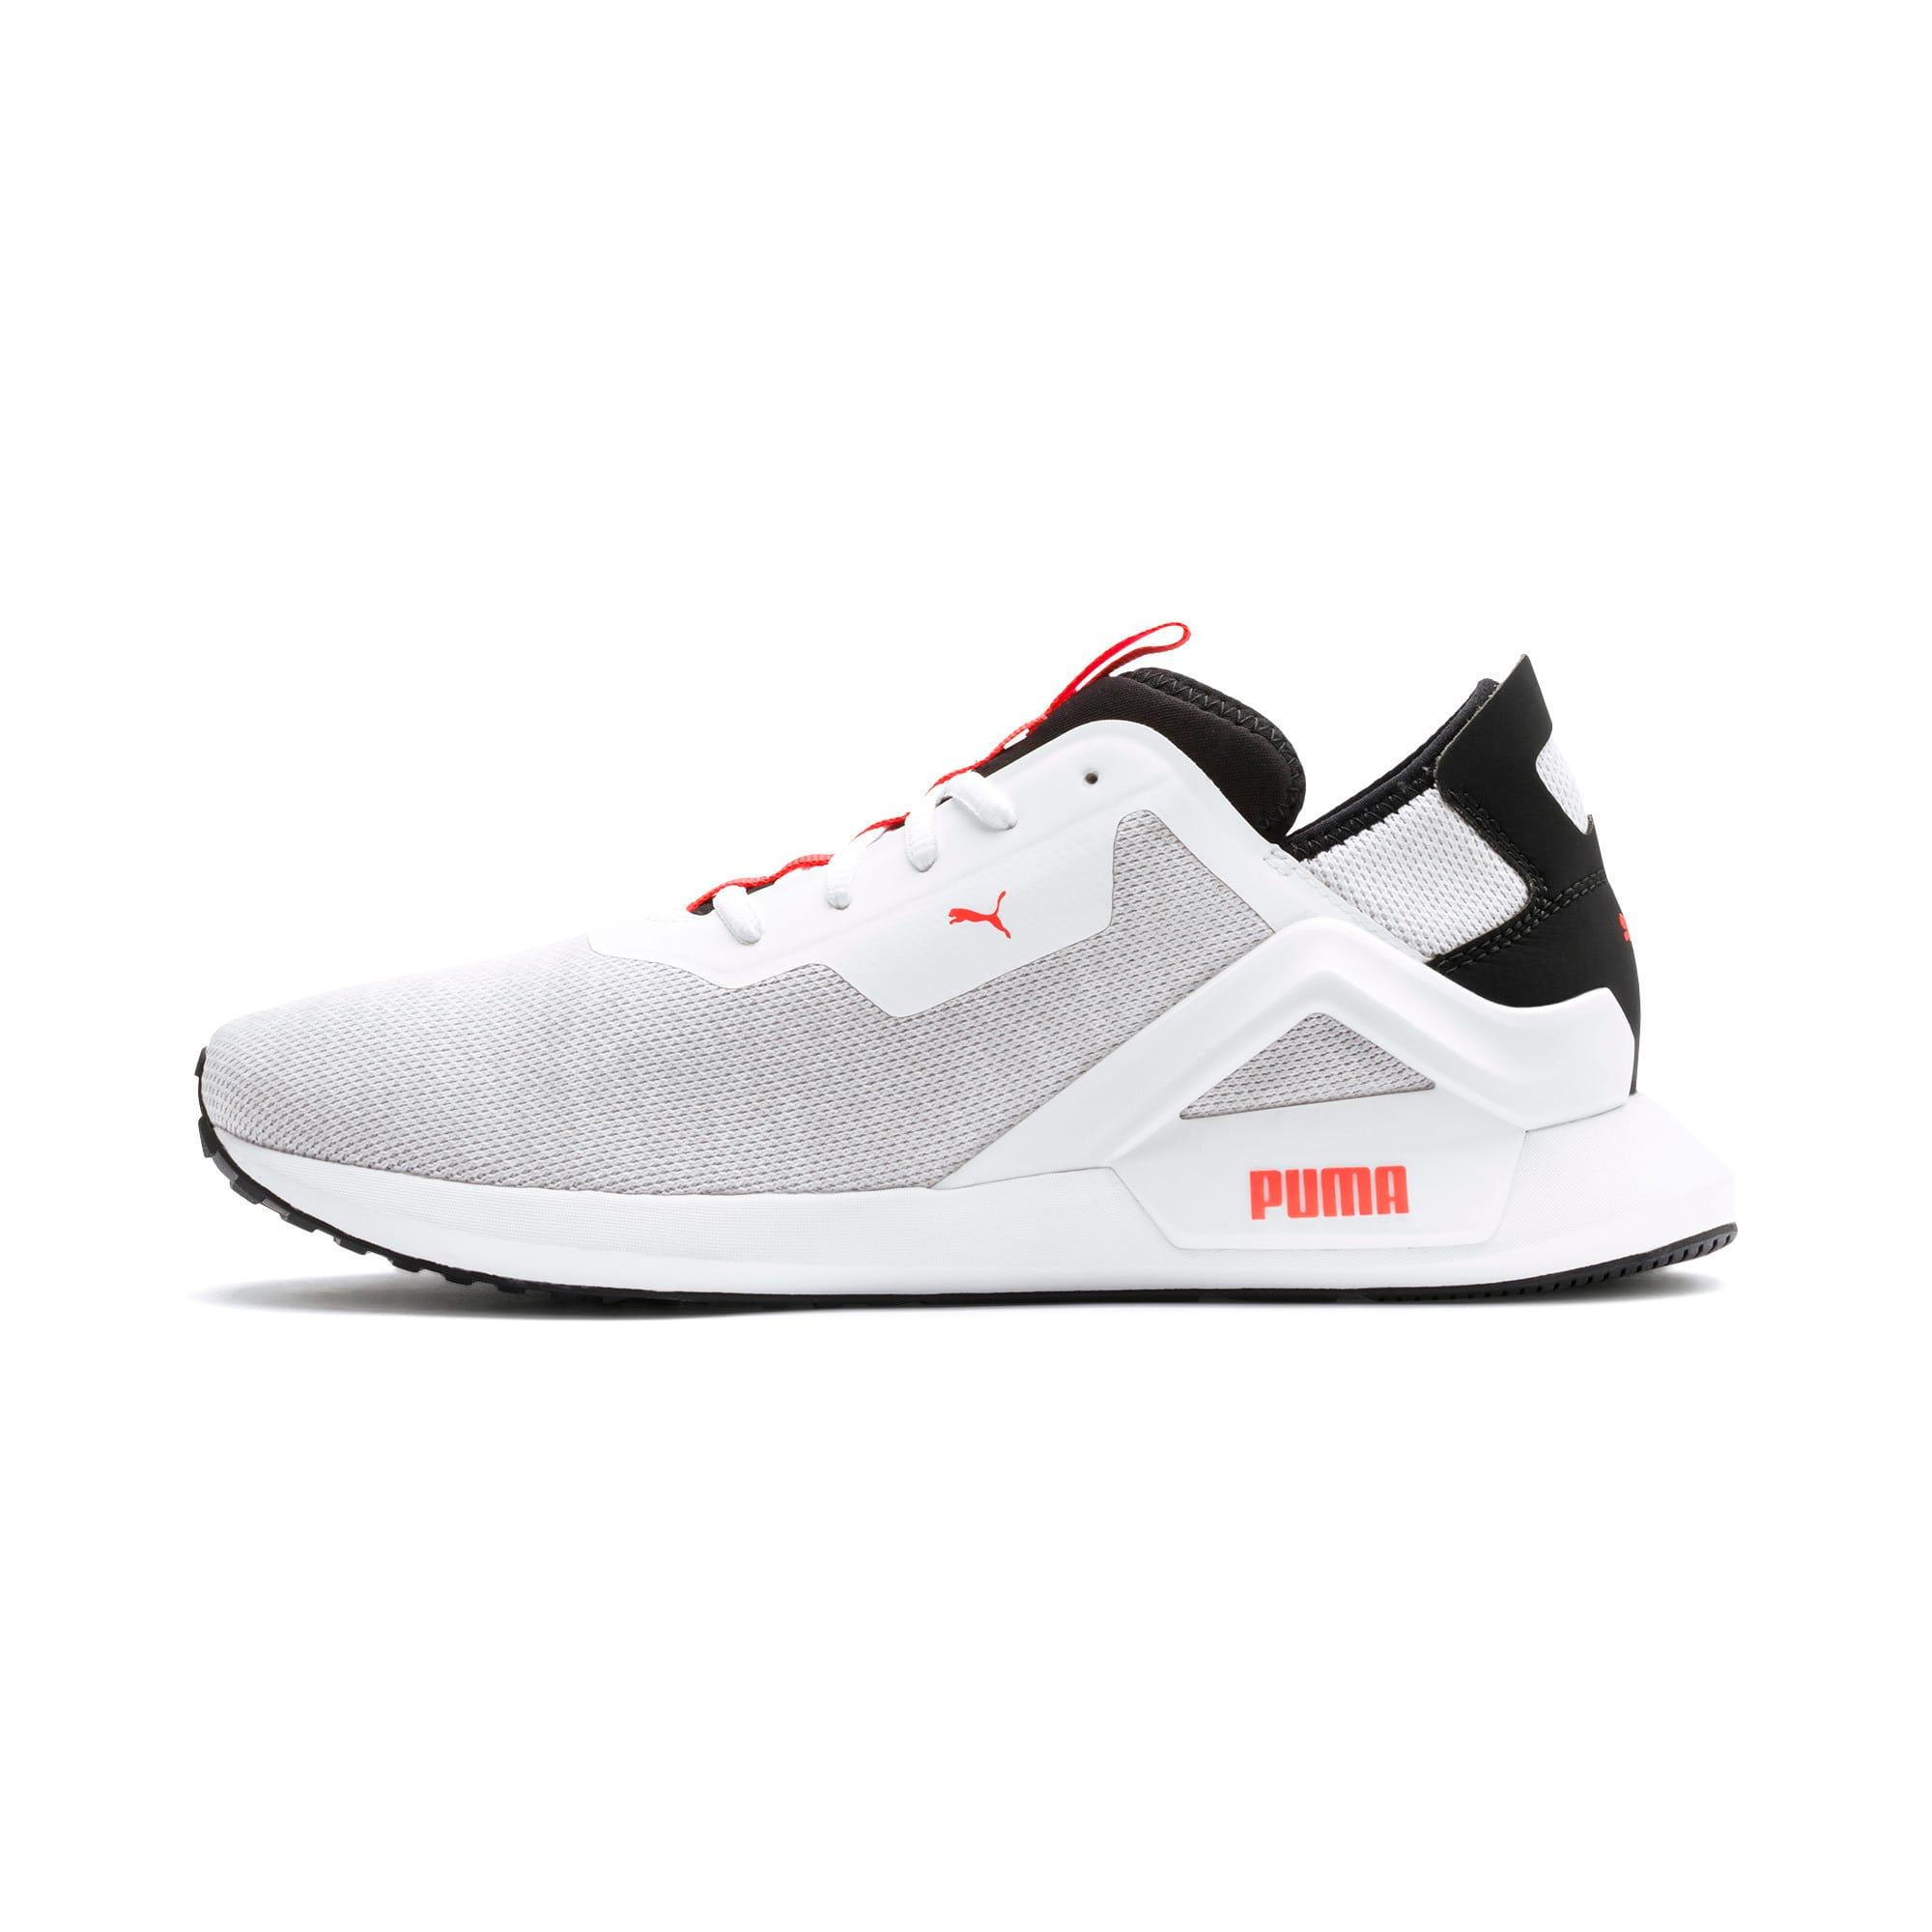 Thumbnail 1 of Rogue X Knit Herren Sneaker, White-Black-Nrgy Red, medium